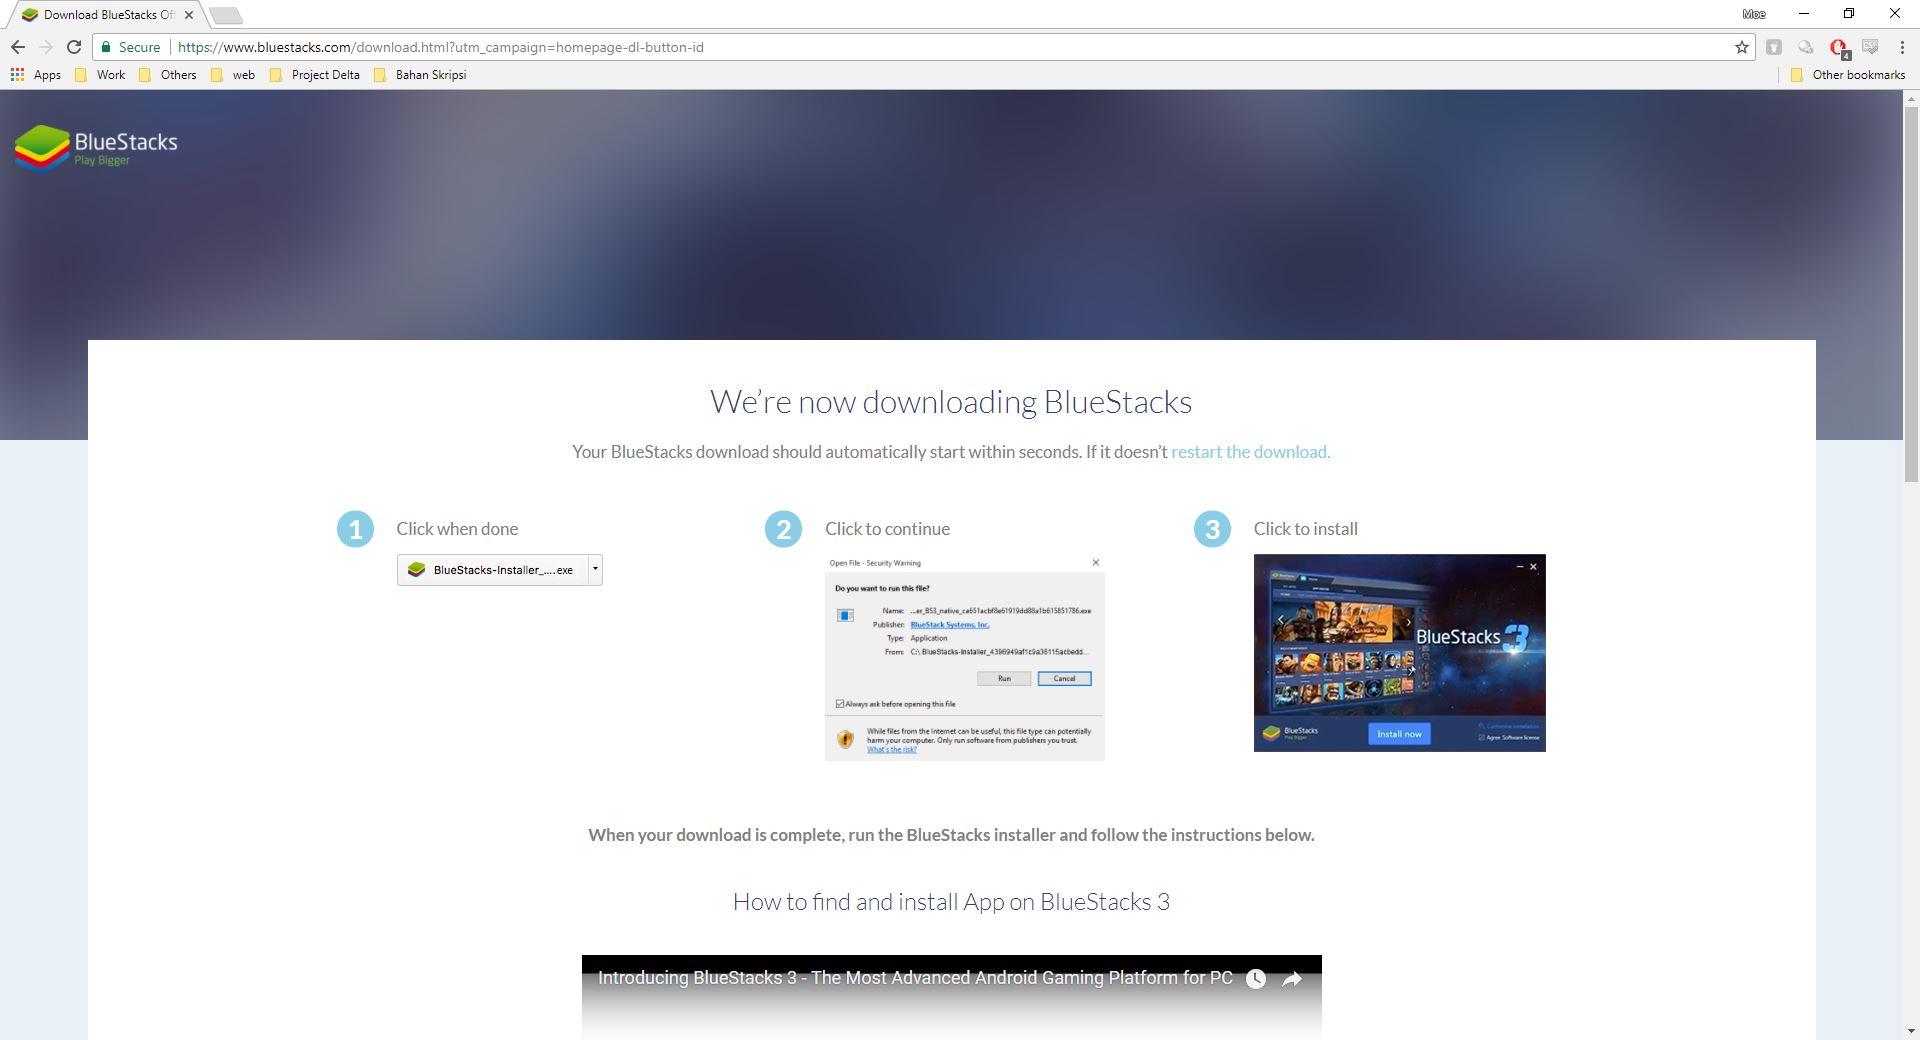 Cara instal aplikasi android di pc tanpa bluestack,medcom id